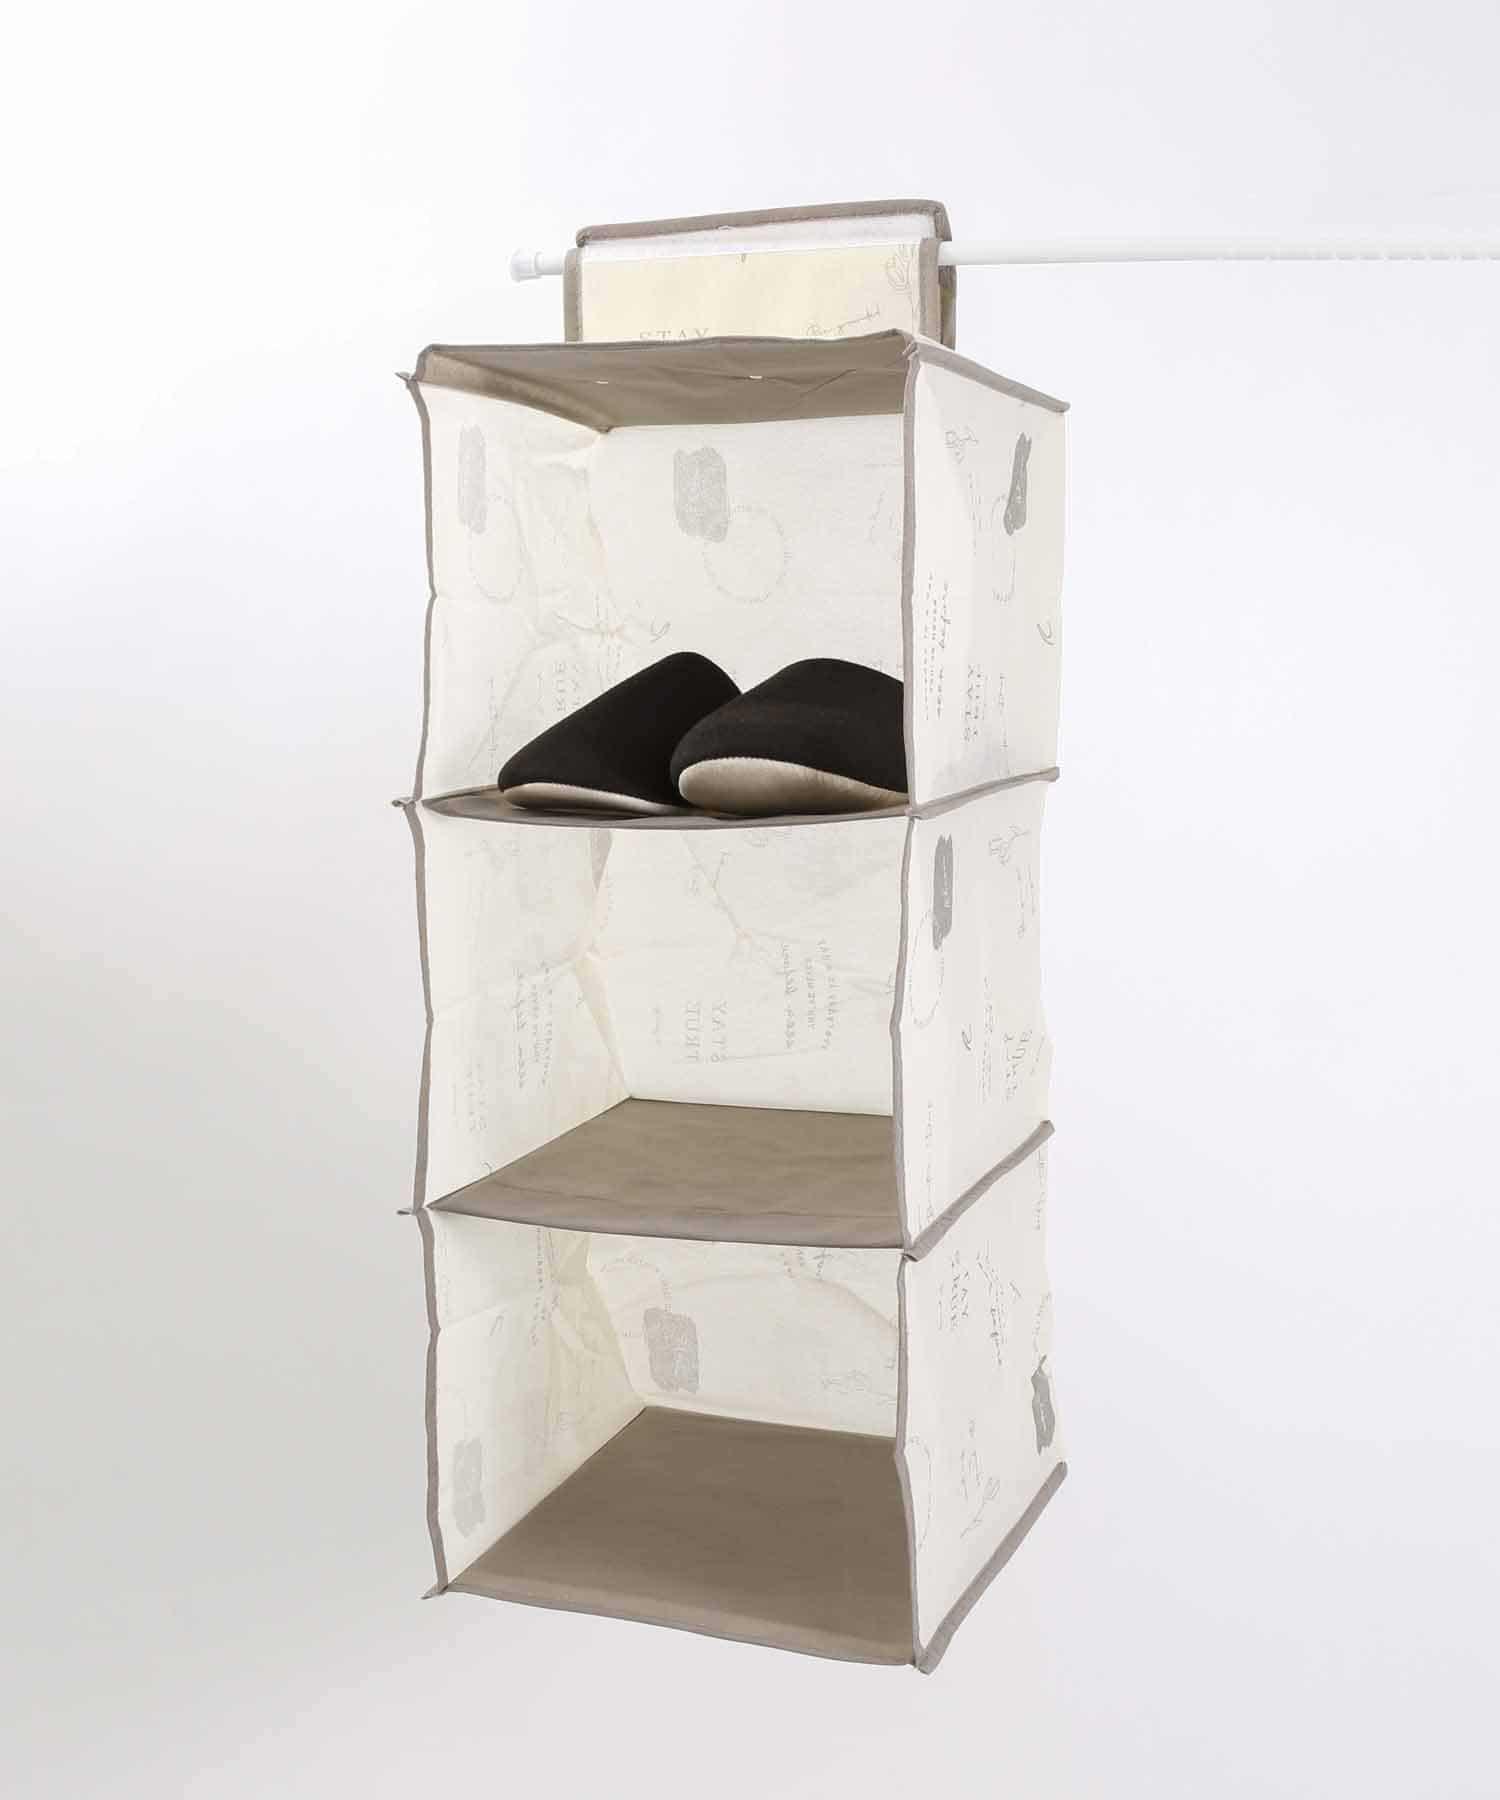 3COINS(スリーコインズ) ライフスタイル 【一部大型店舗限定】吊り下げ三段収納ワイド アイボリー